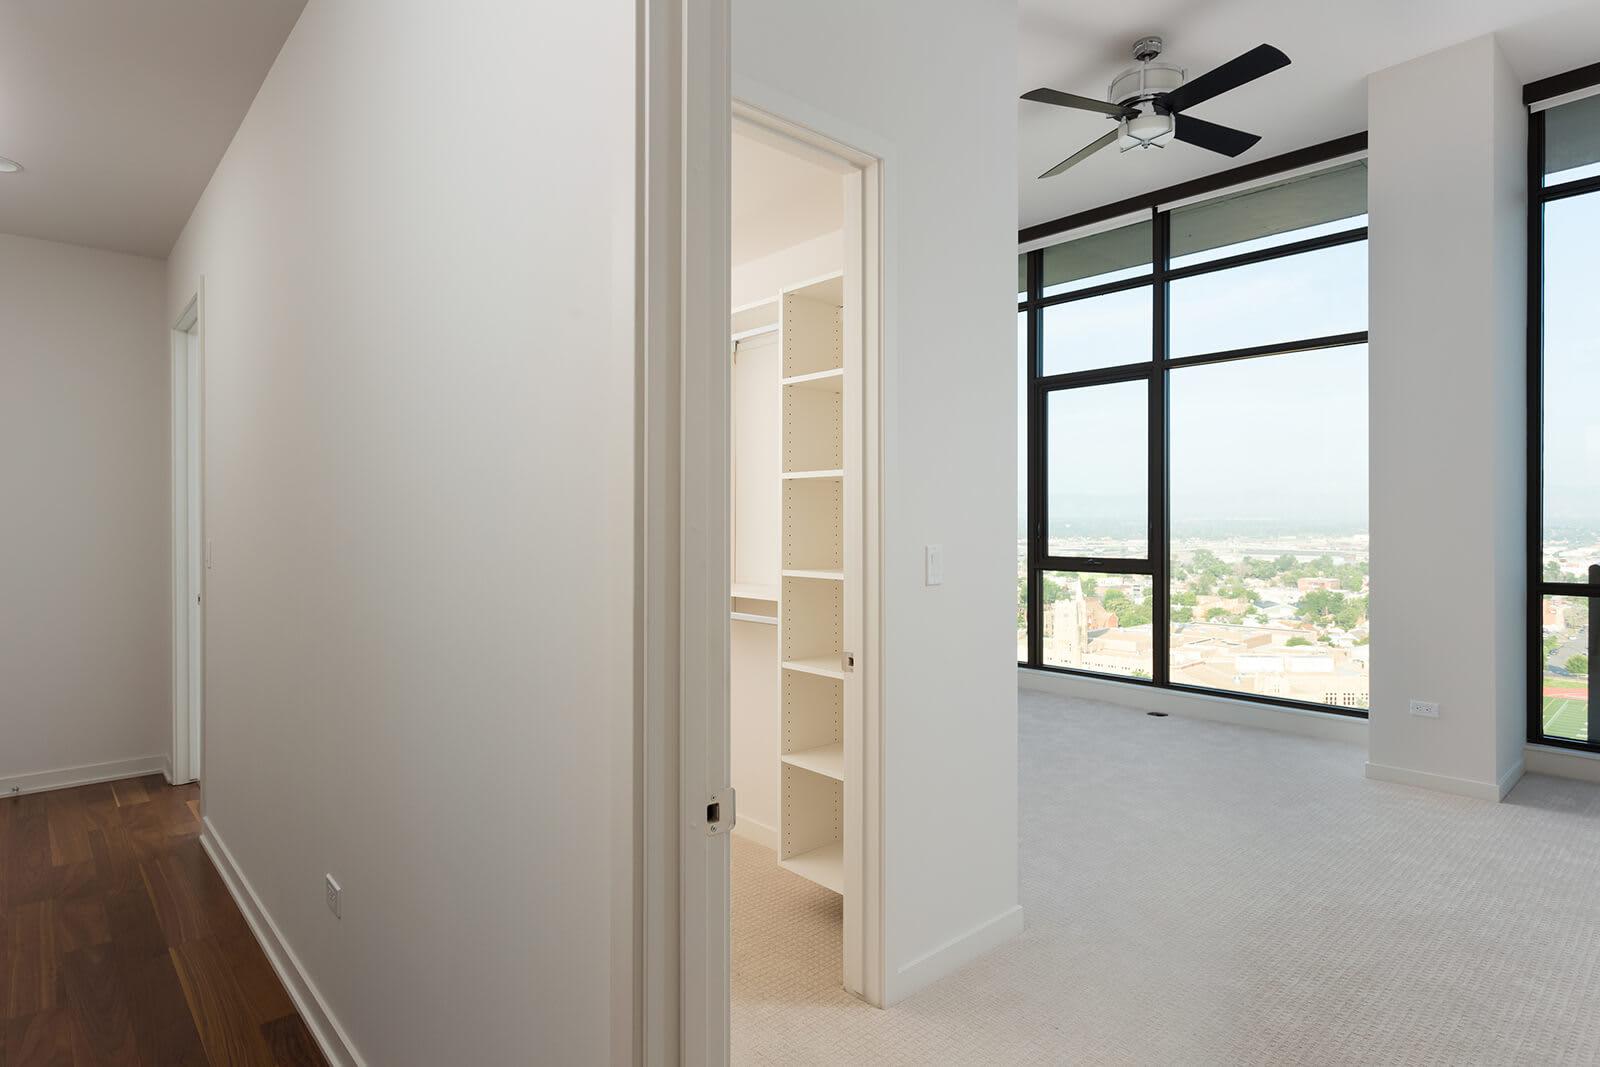 Walk-In Closets with Built-In Shelving at 1000 Speer by Windsor, 1000 Speer Blvd., Denver